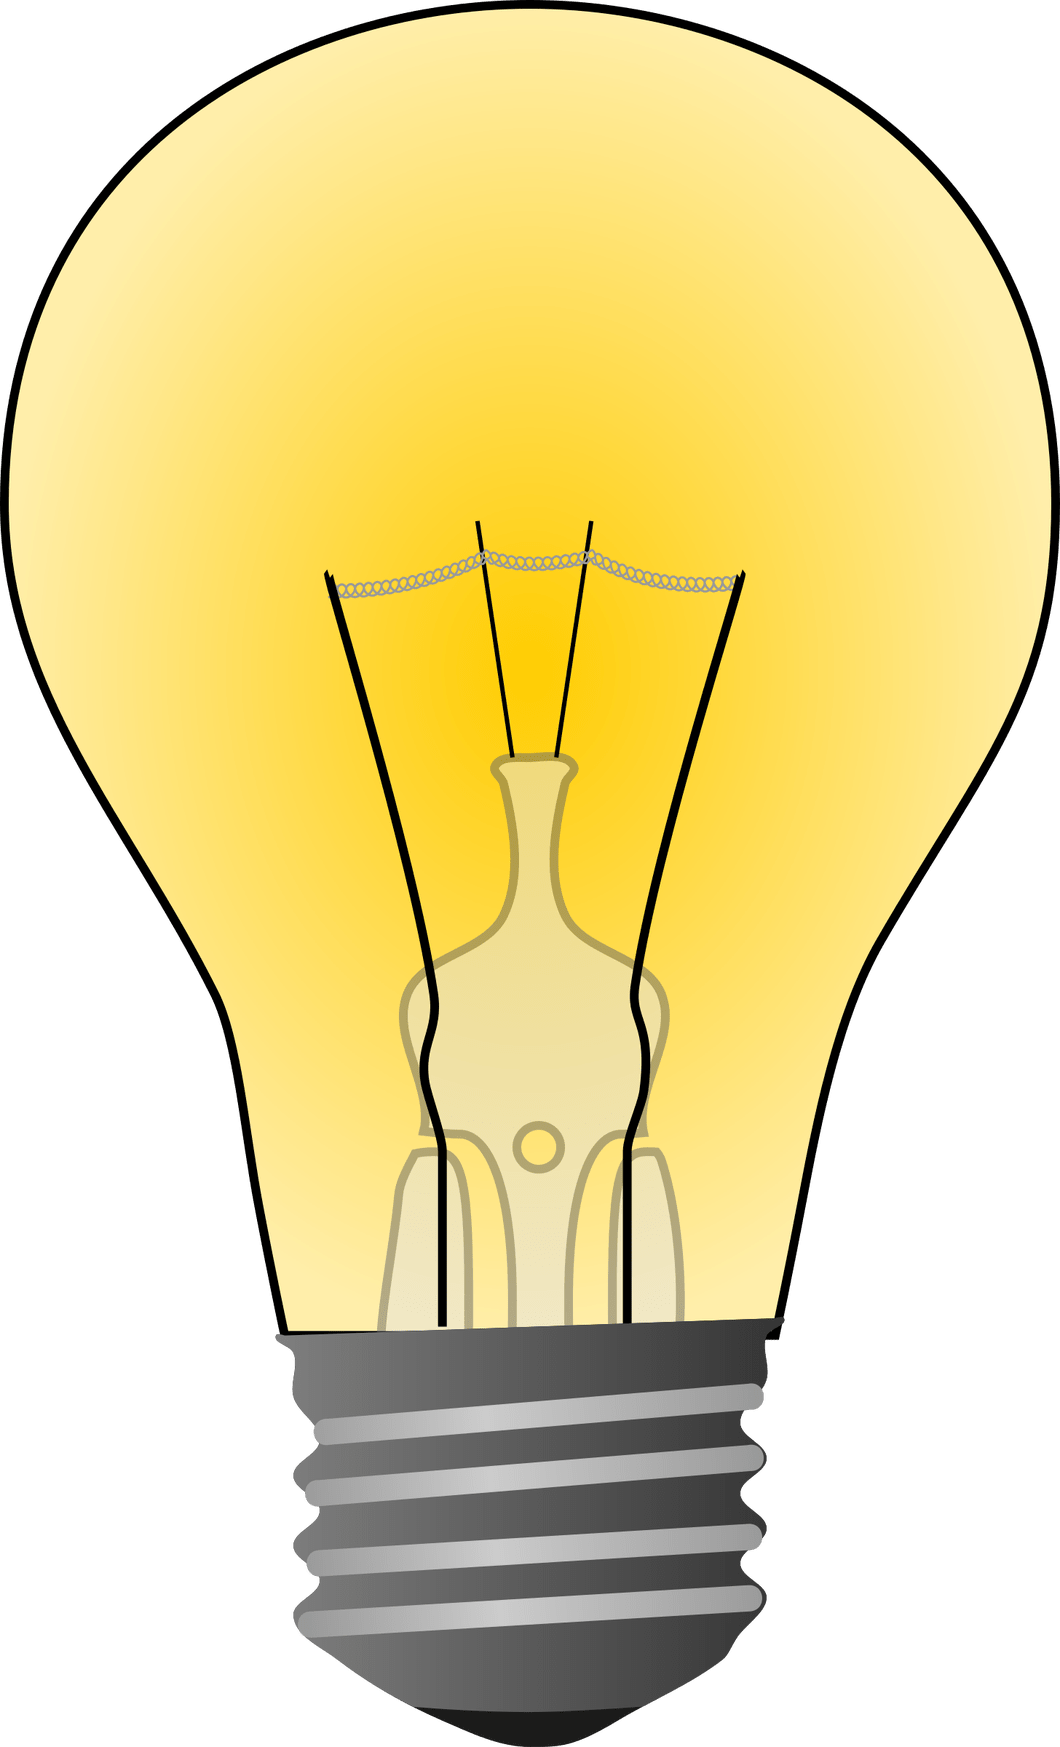 svg transparent stock Light bulb clip art. Lights clipart bold.